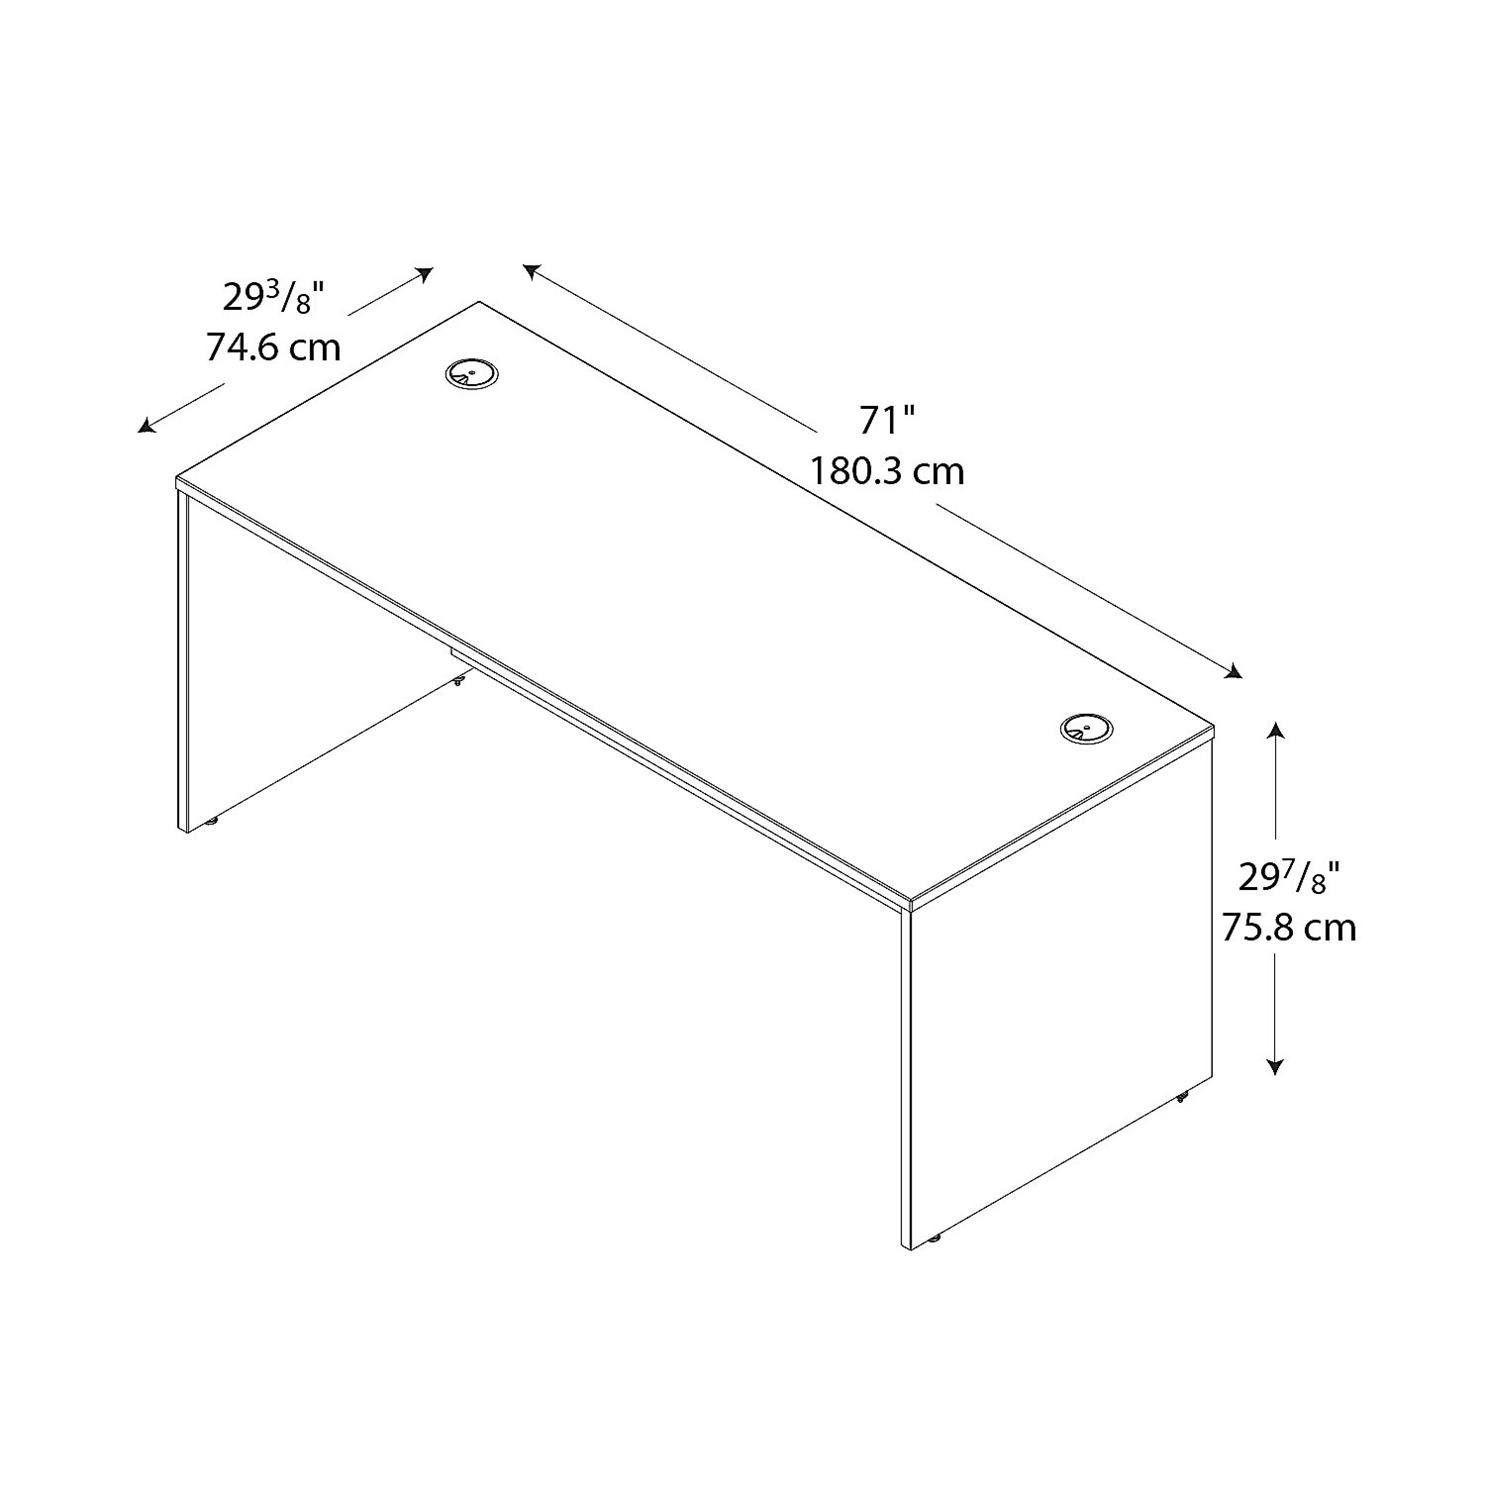 Versareu0027s Standard Desk Cubicle Space Dimensions Design Inspirations